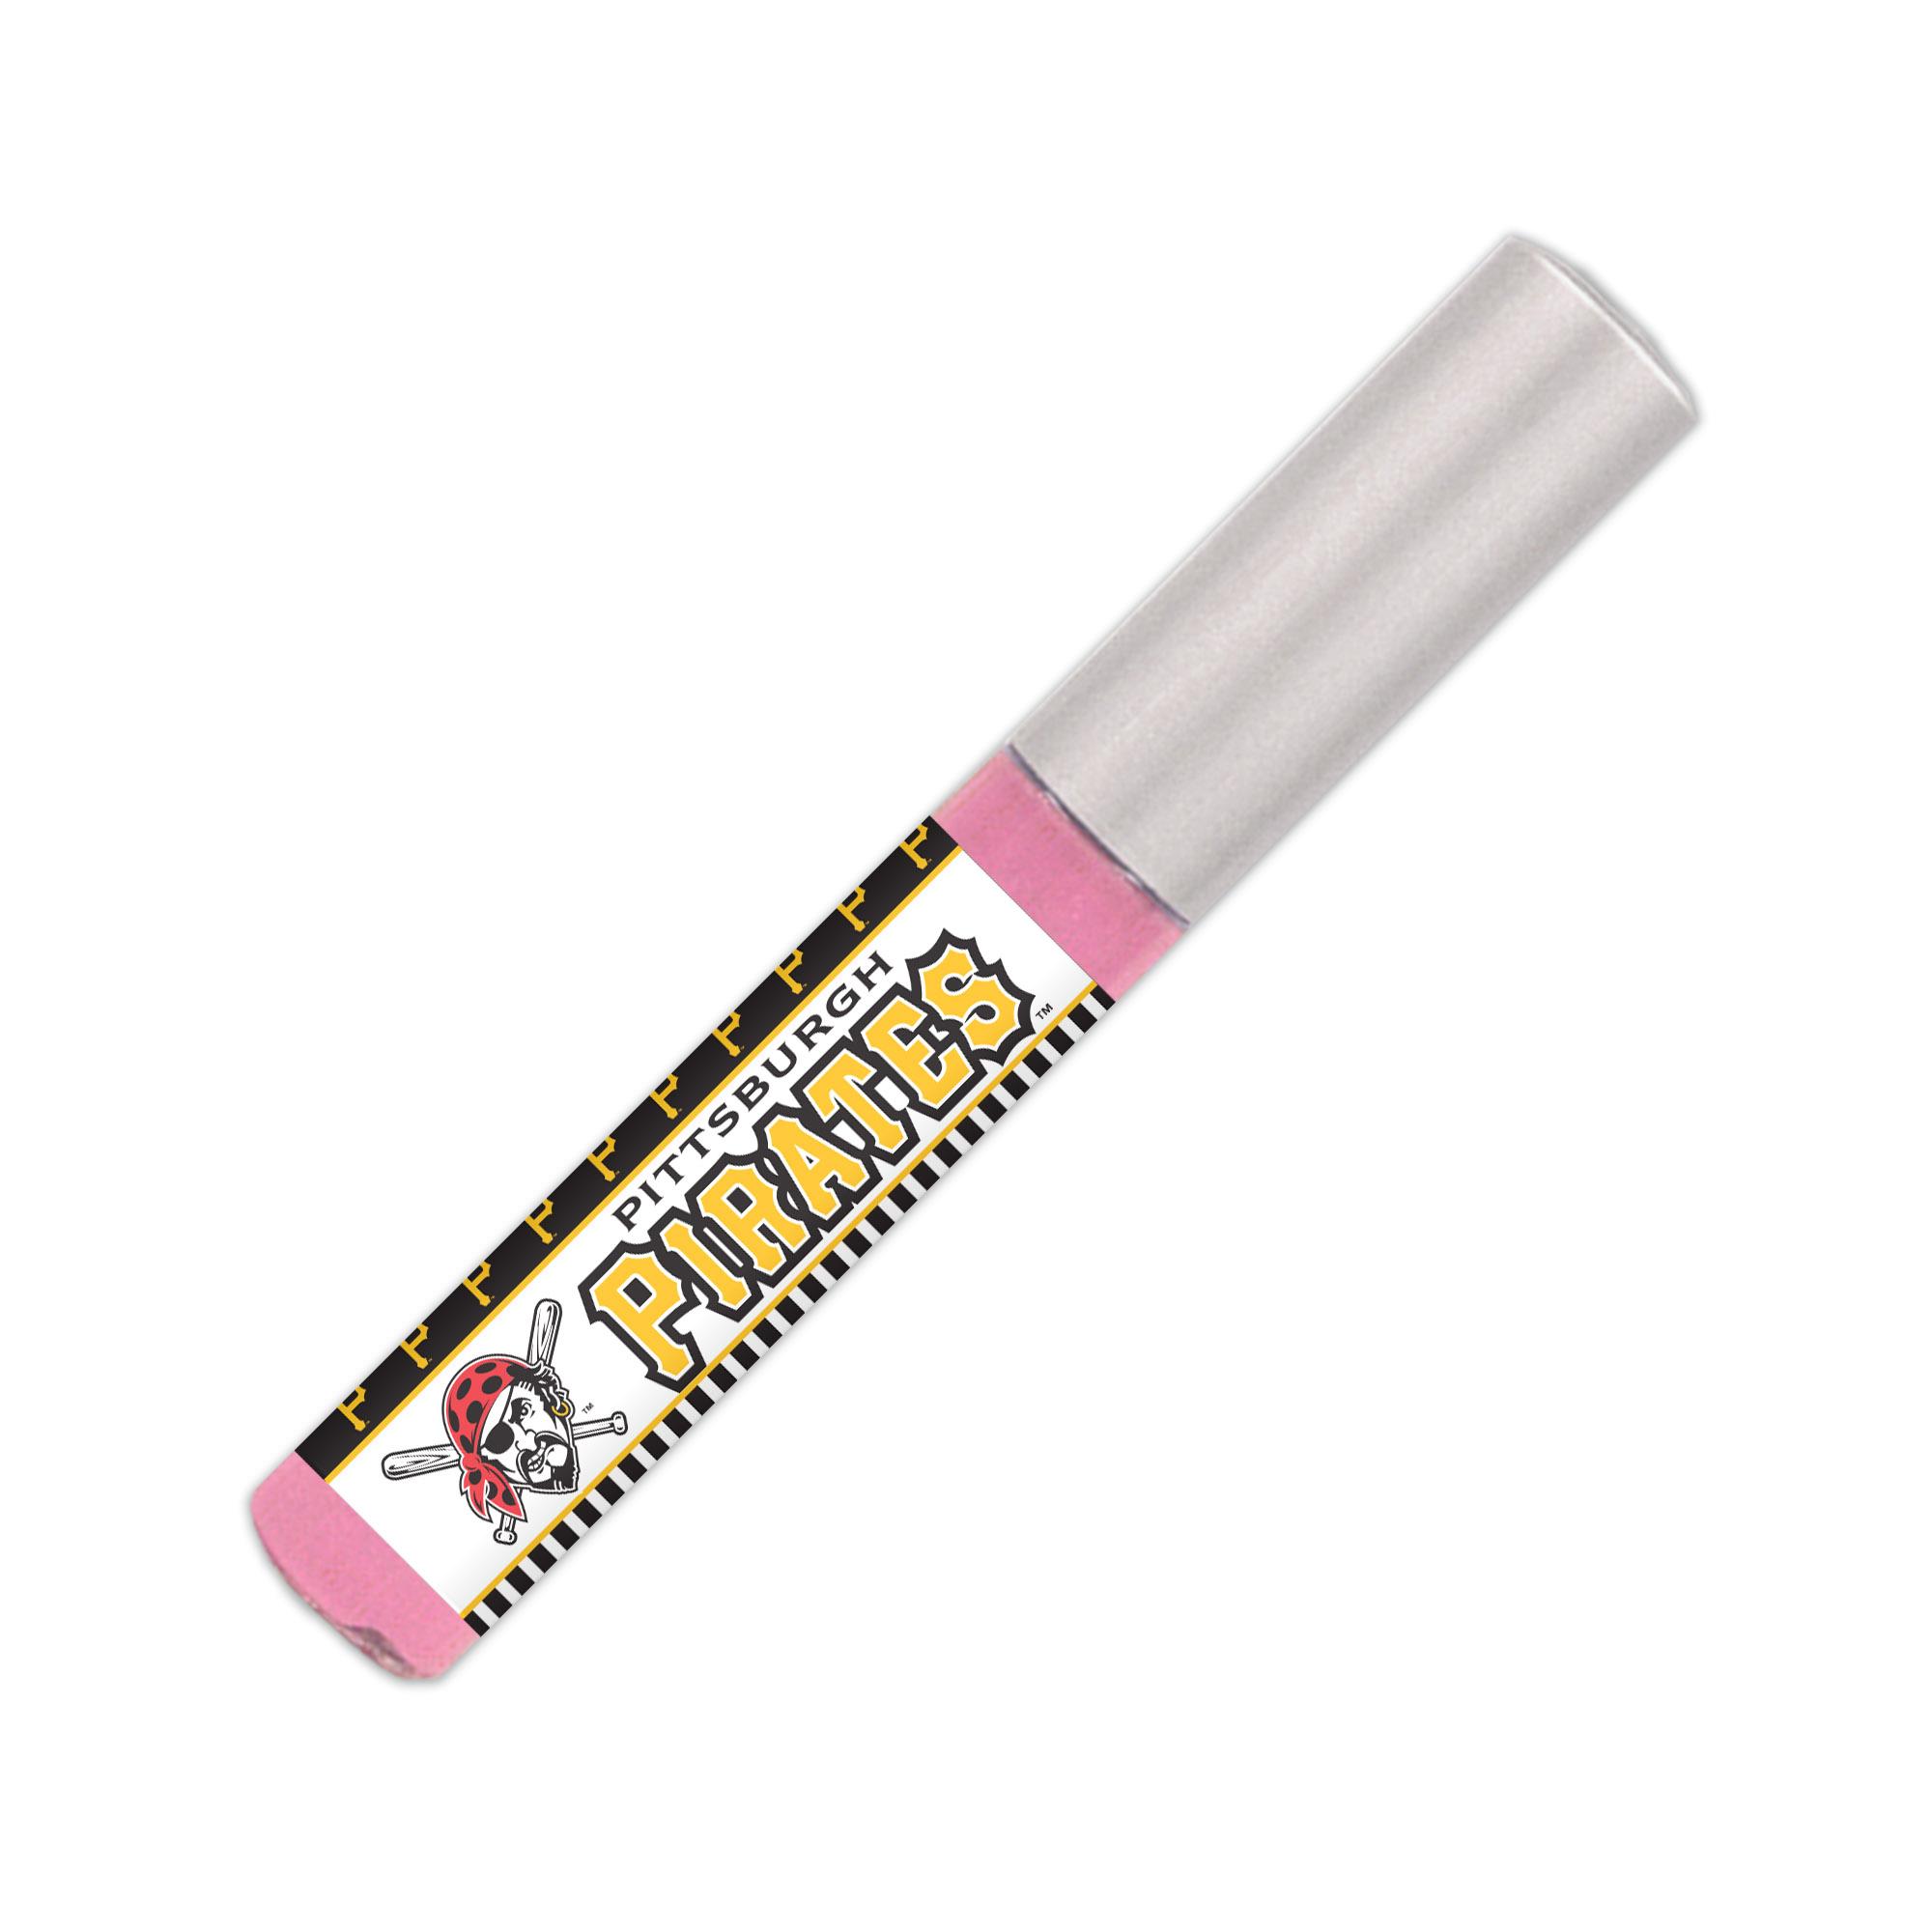 Pittsburgh Pirates Bubble Gum Lip Gloss - No Size